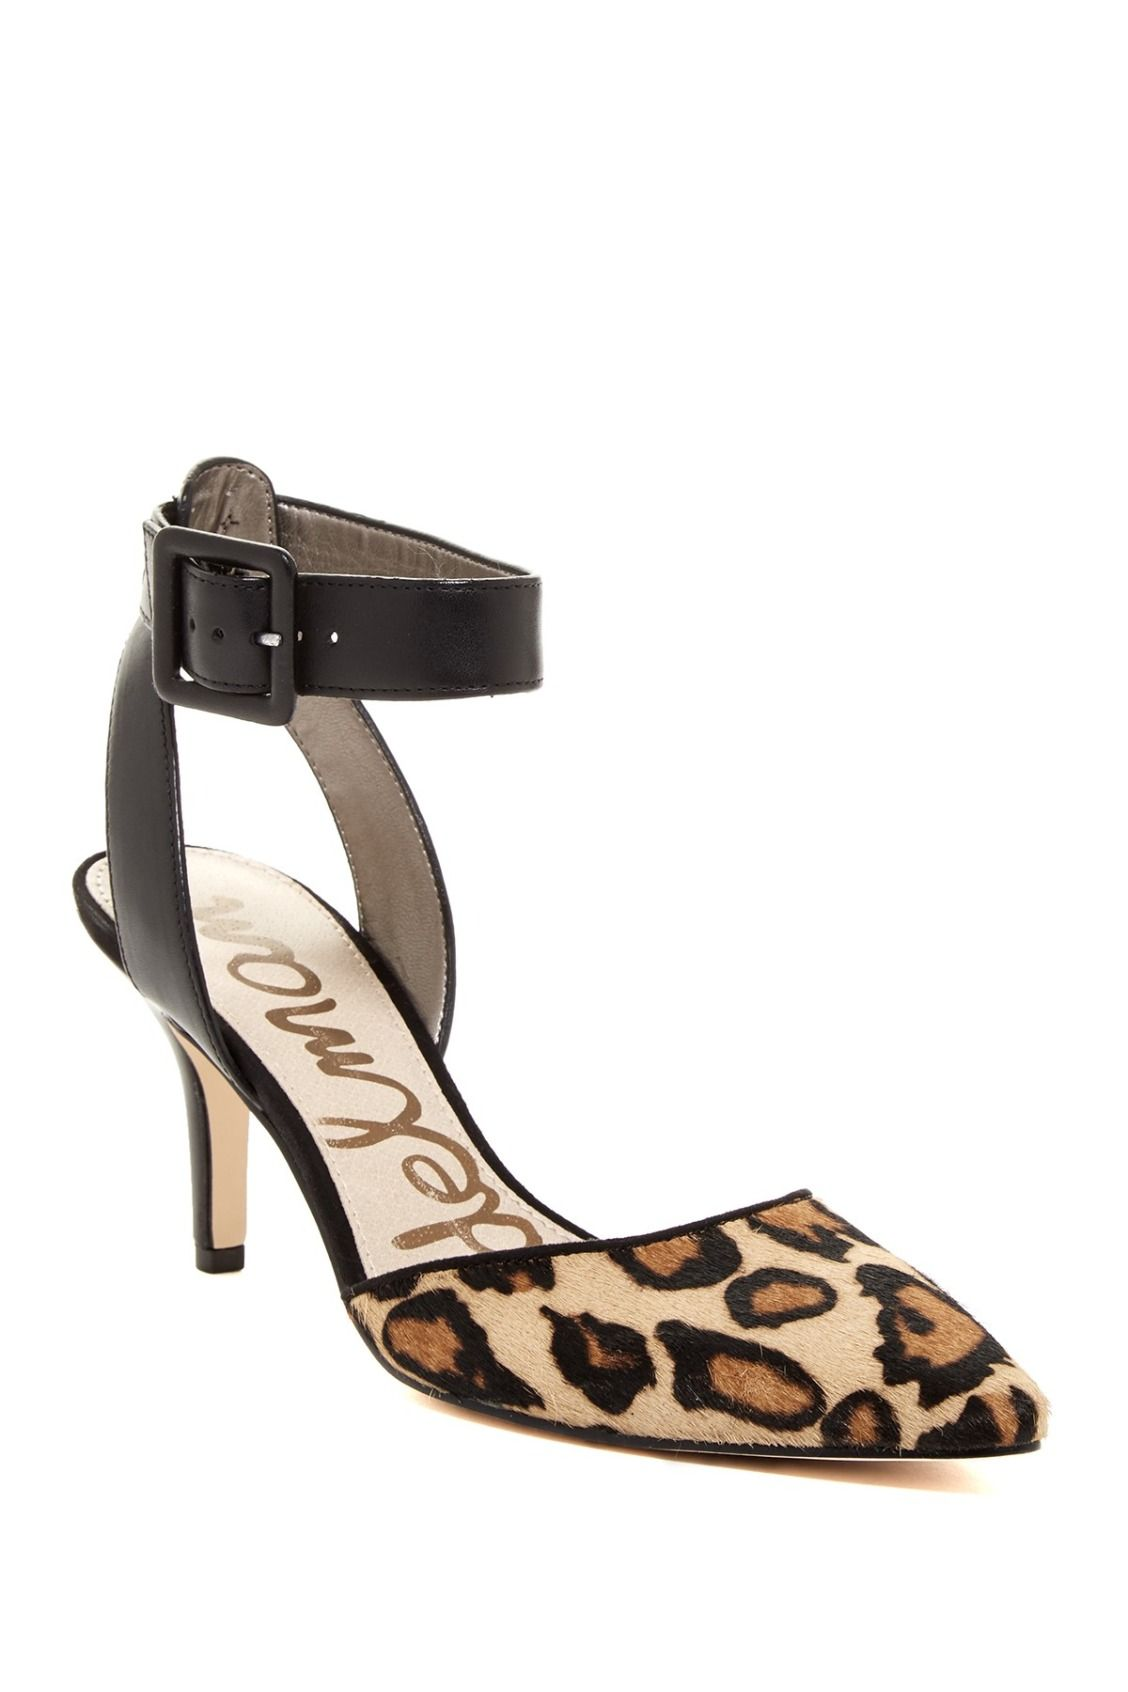 7a6baab6764d10 Little bit of leopard! Sam Edelman Okala Ankle Strap Pumps